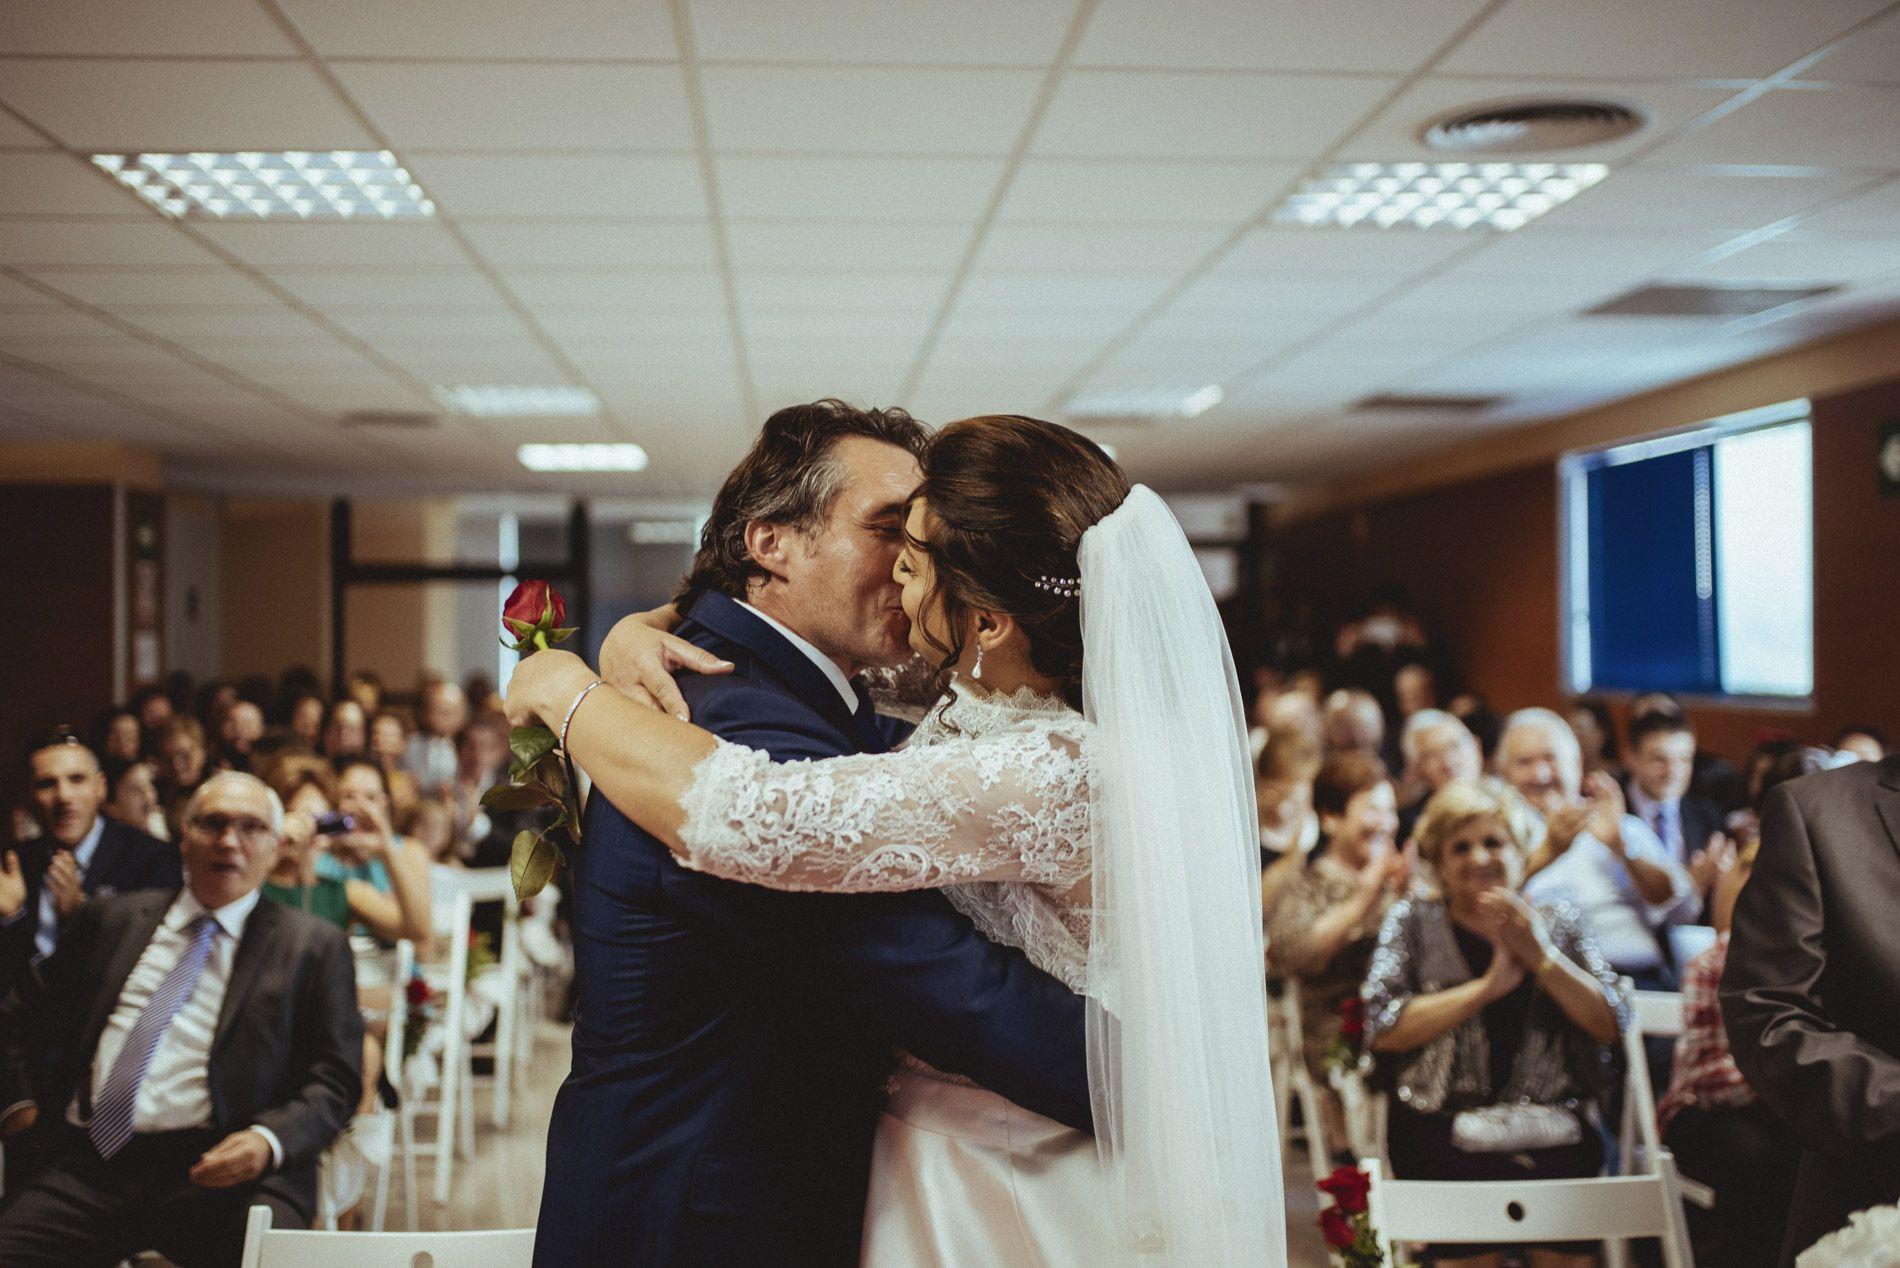 fotografia-boda-santi-miquel-bj-031